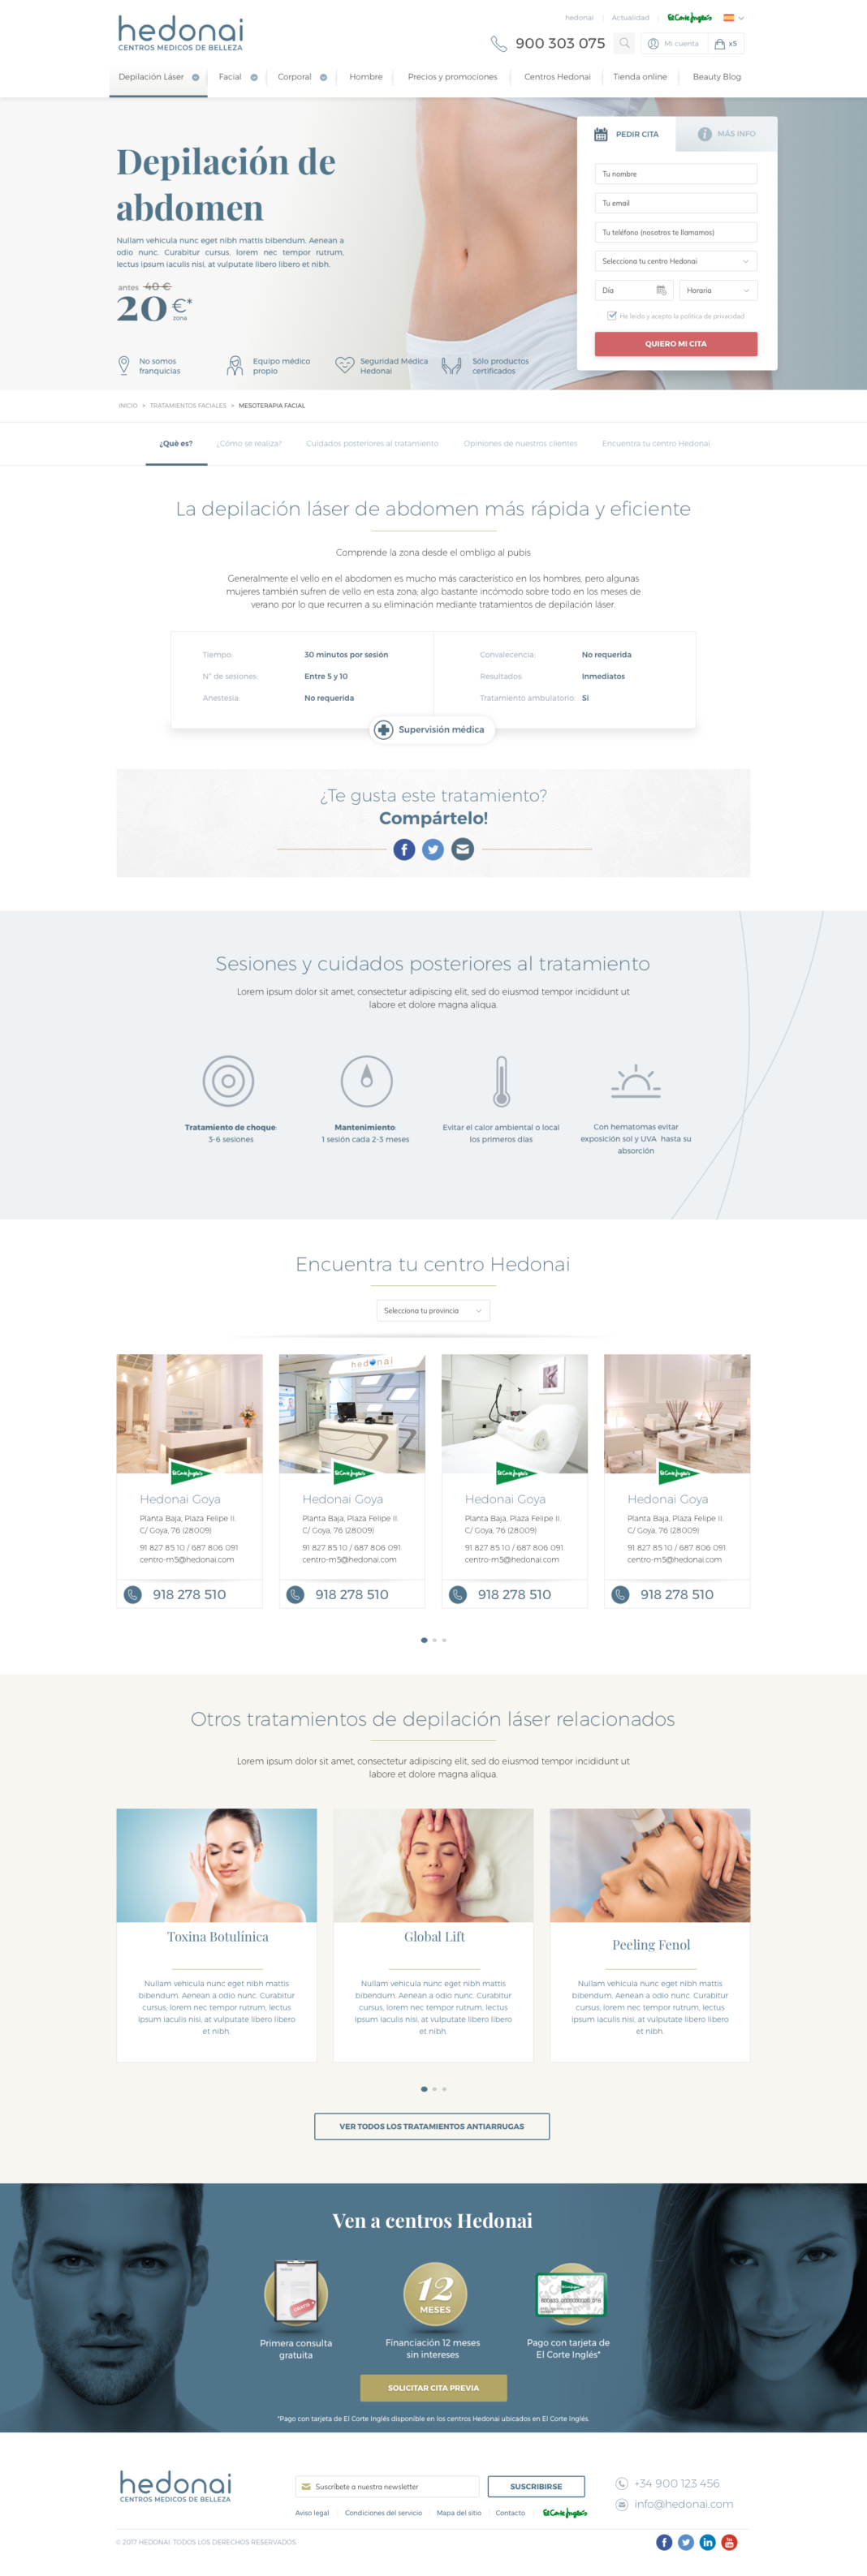 Diseño web, desarrollo web de Hedonai